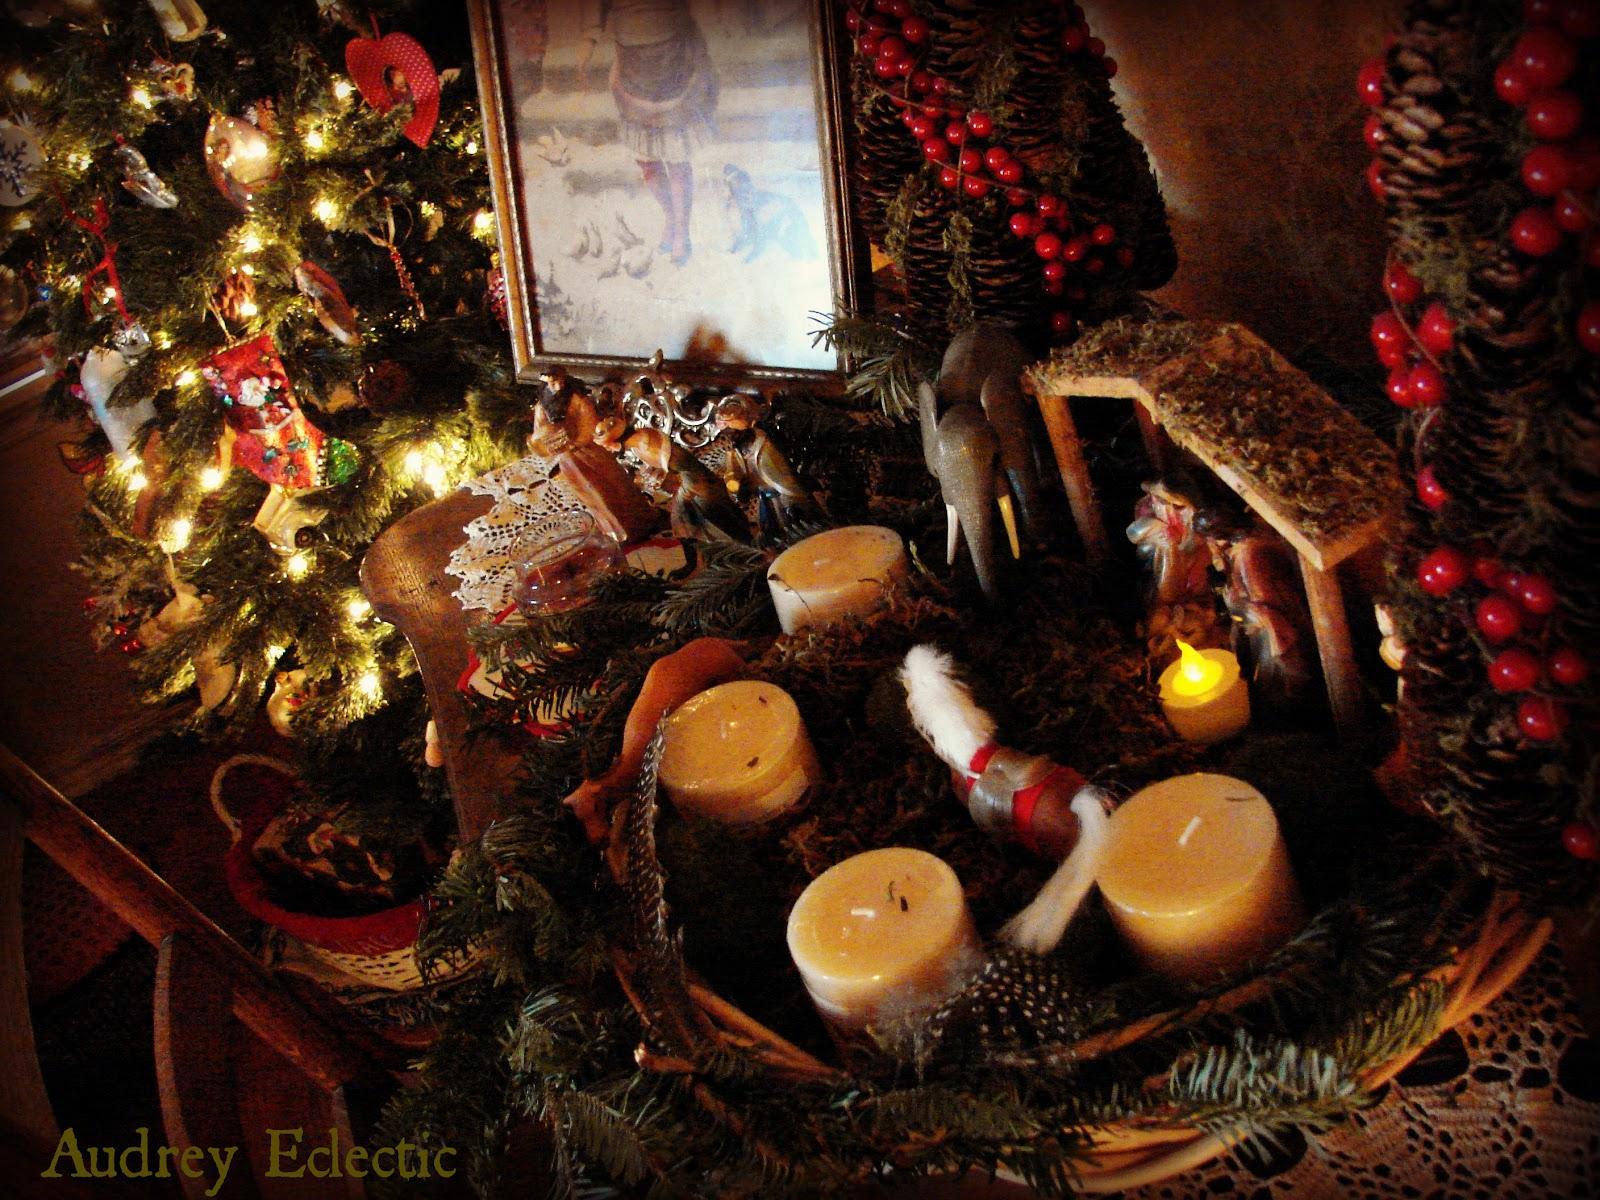 Advent Wreath Wallpaper Wednesday, november 28, 2012